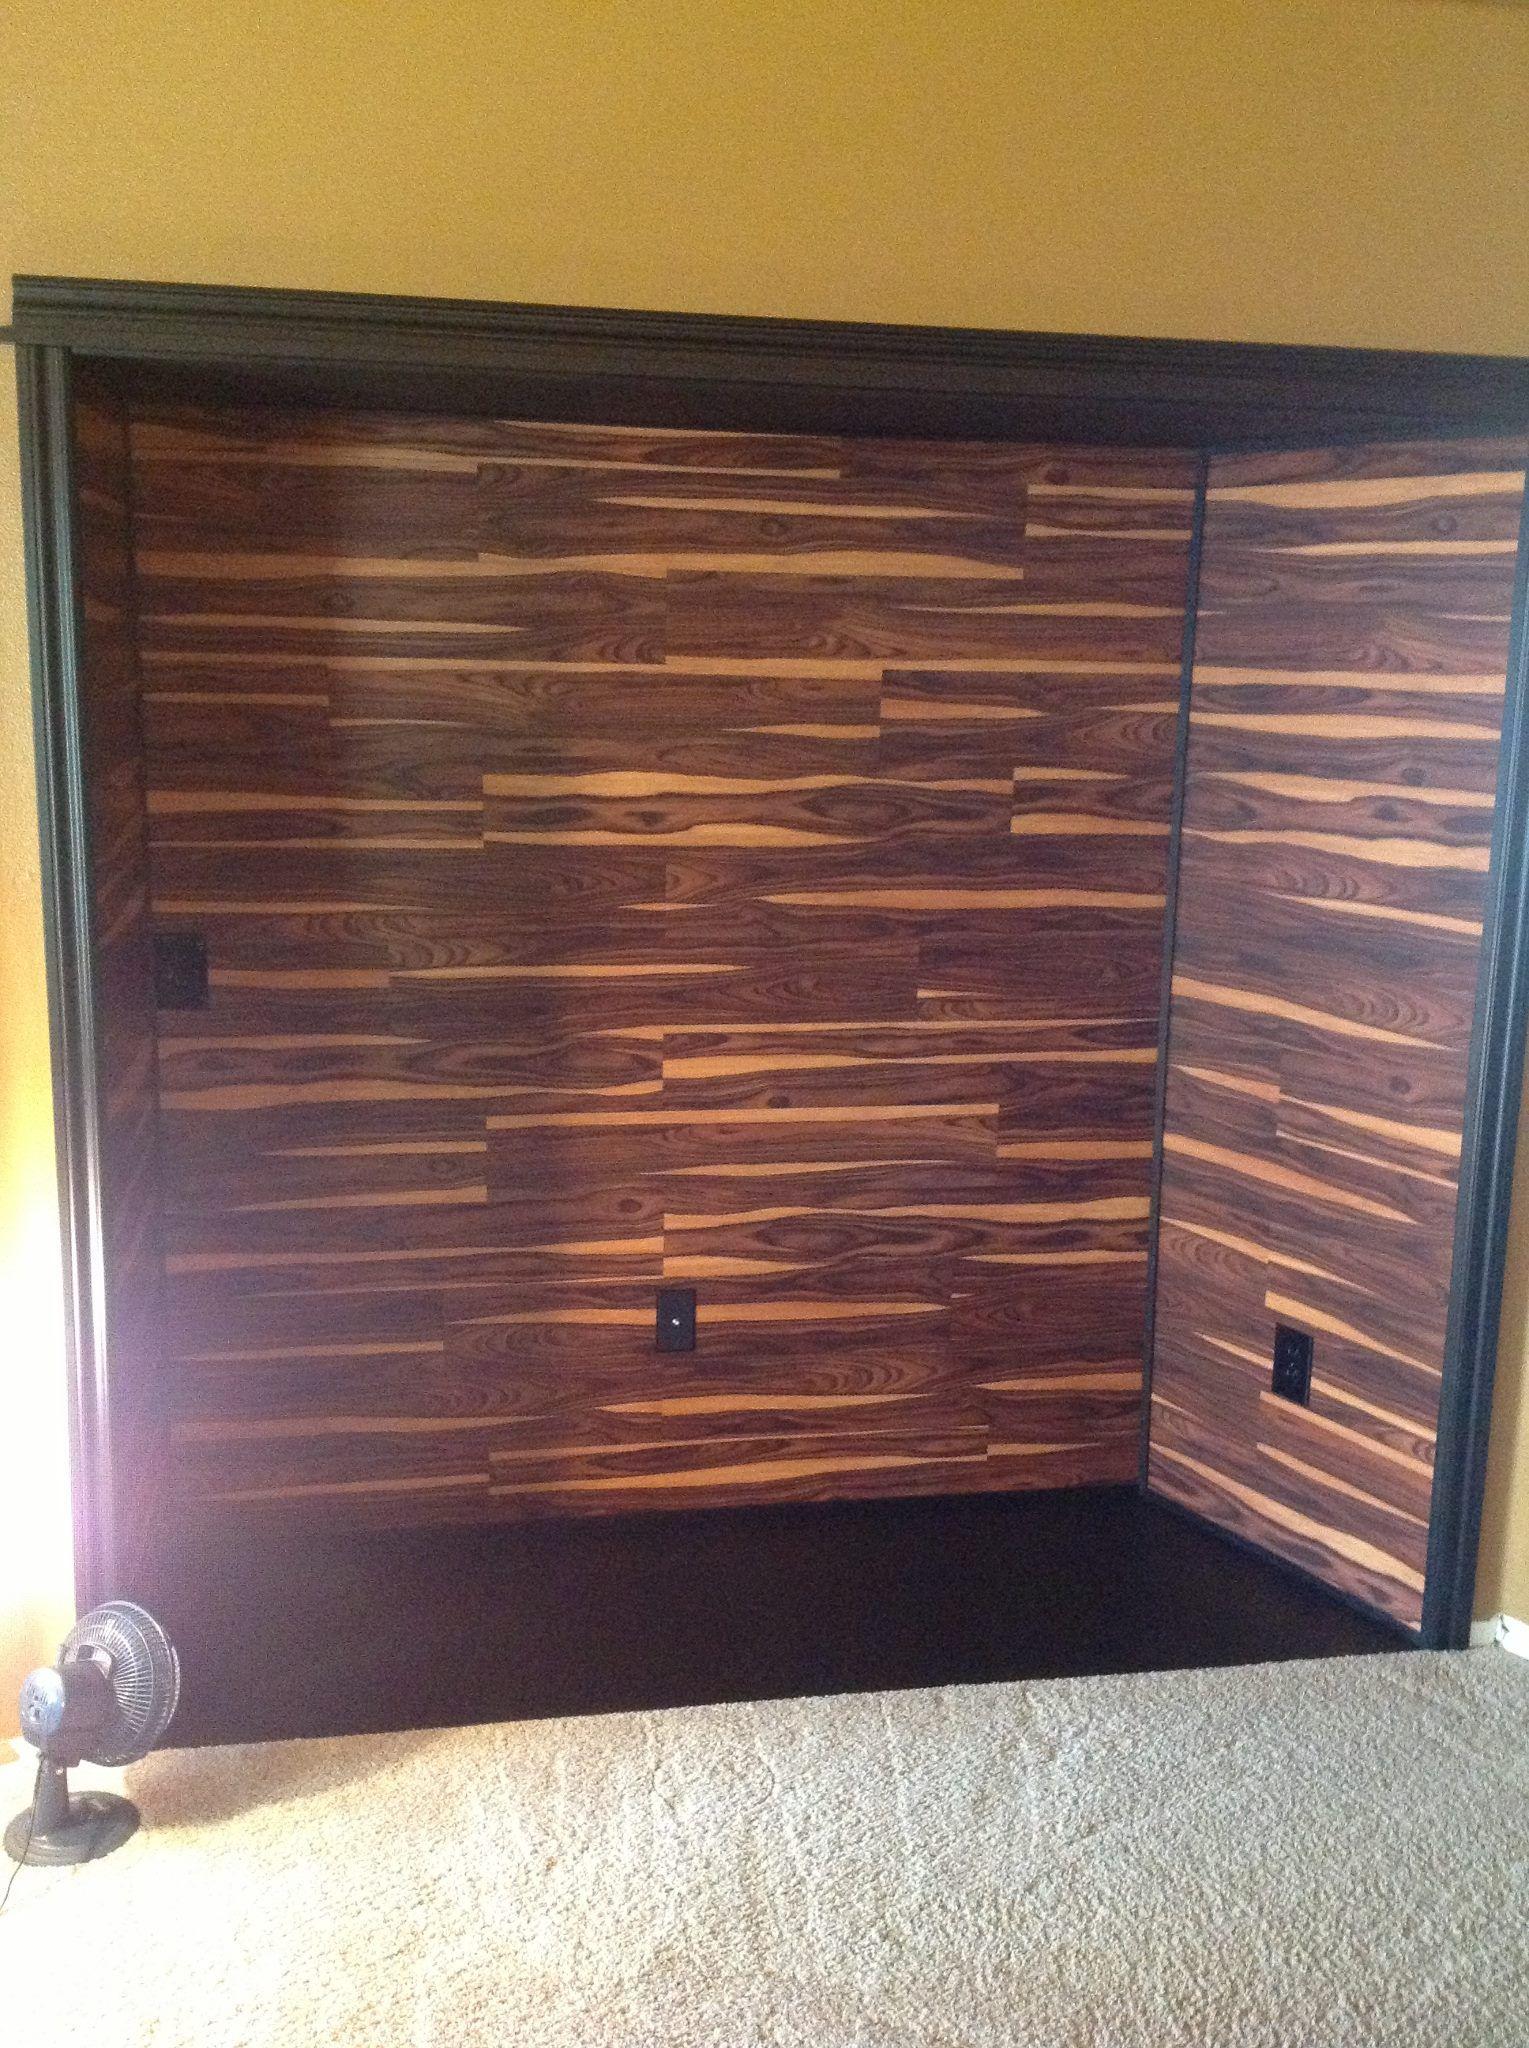 Inset Is Complete On The Wall We Glued Allure Vinyl Plank Flooring In African Allure Vinyl Plank Flooring Unfinished Basement Decorating Vinyl Plank Flooring